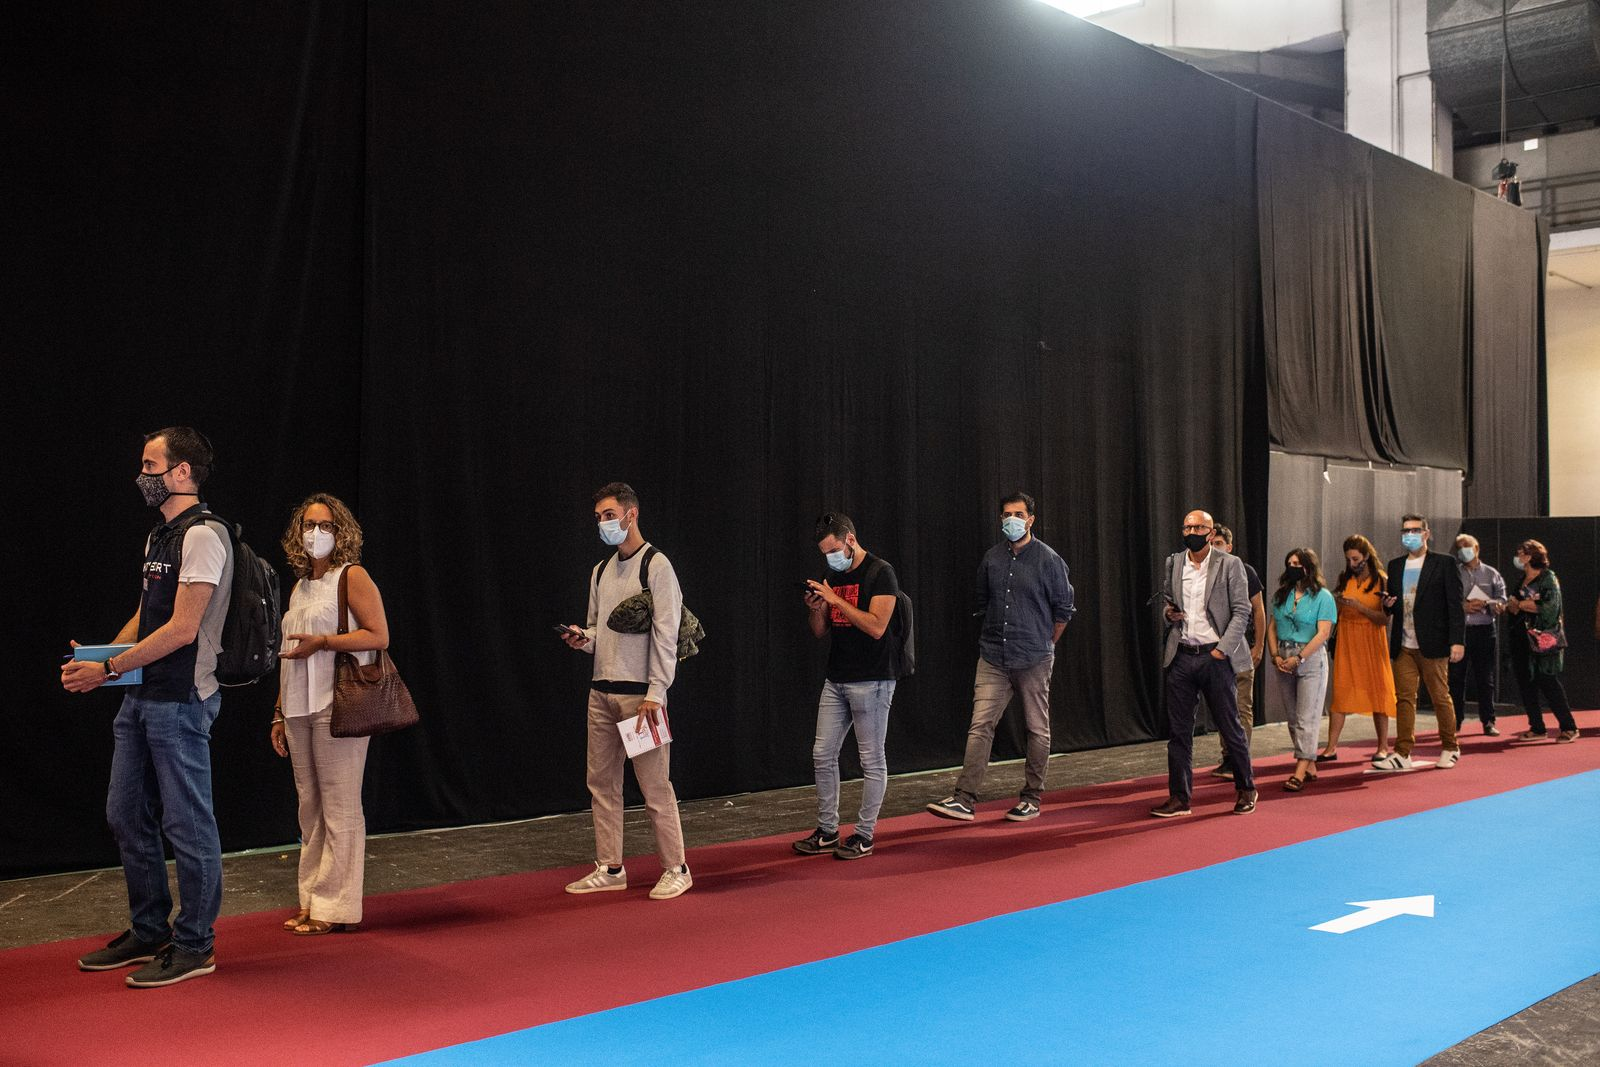 Barcelona Fair In Effort To Lift Economy Amid Coronavirus